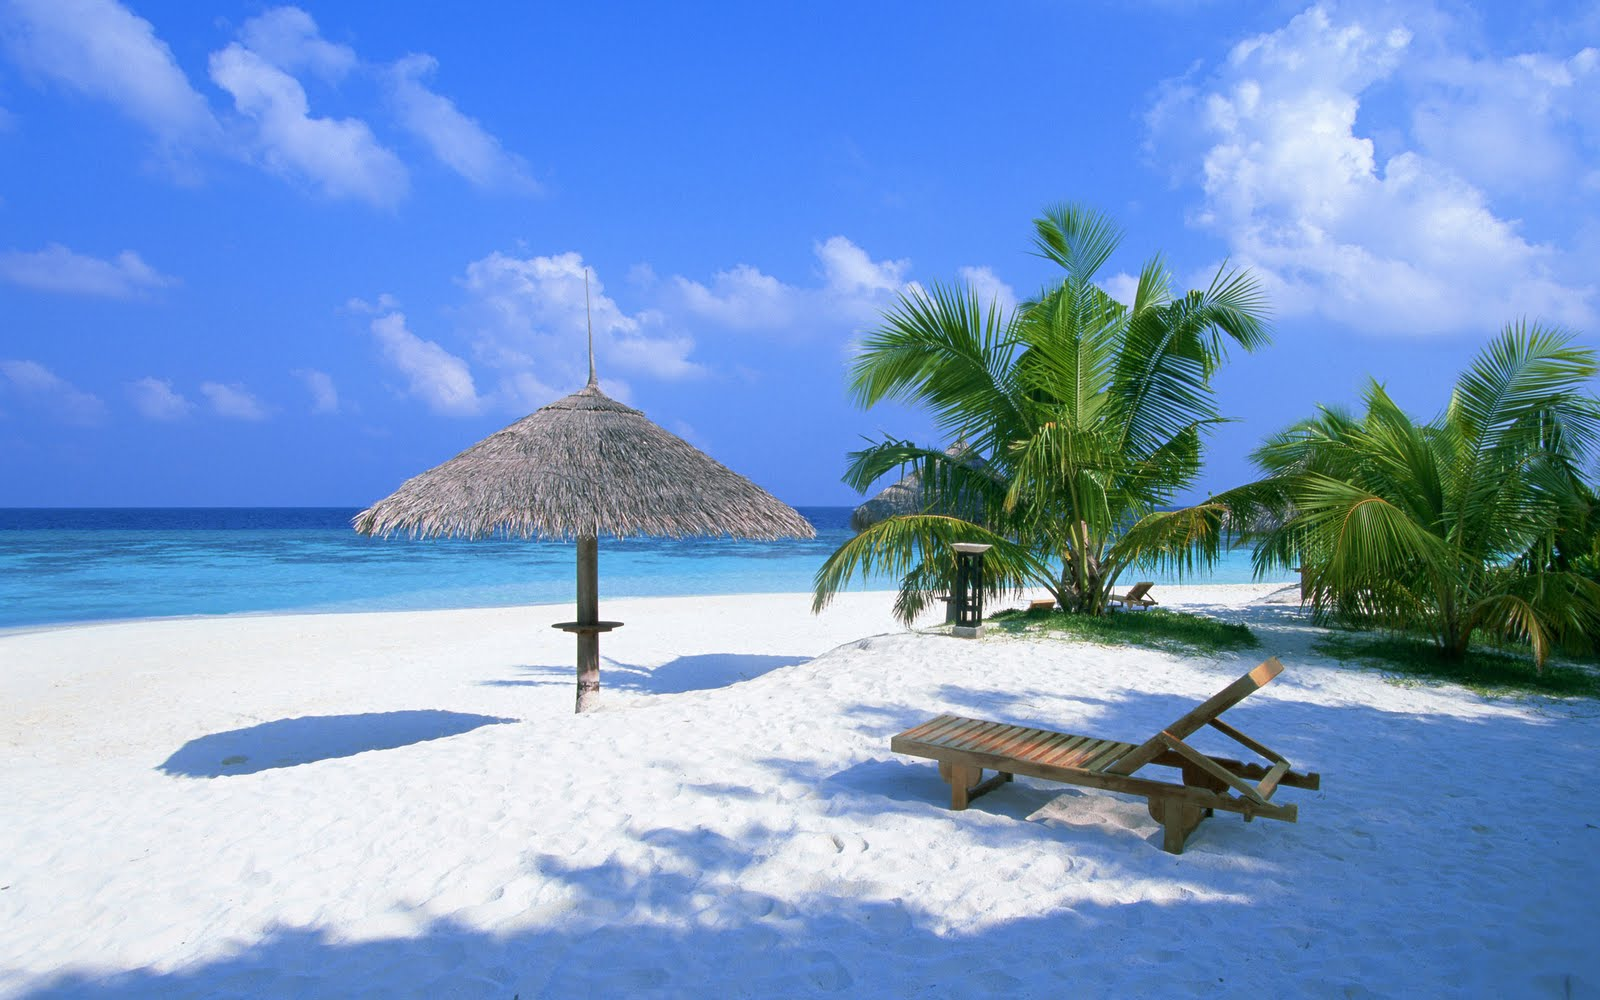 http://2.bp.blogspot.com/_2IU2Nt4rD1k/TD4KKfrgIoI/AAAAAAAAB4c/odH1WgLYPaM/s1600/blue_beach_hd.jpg